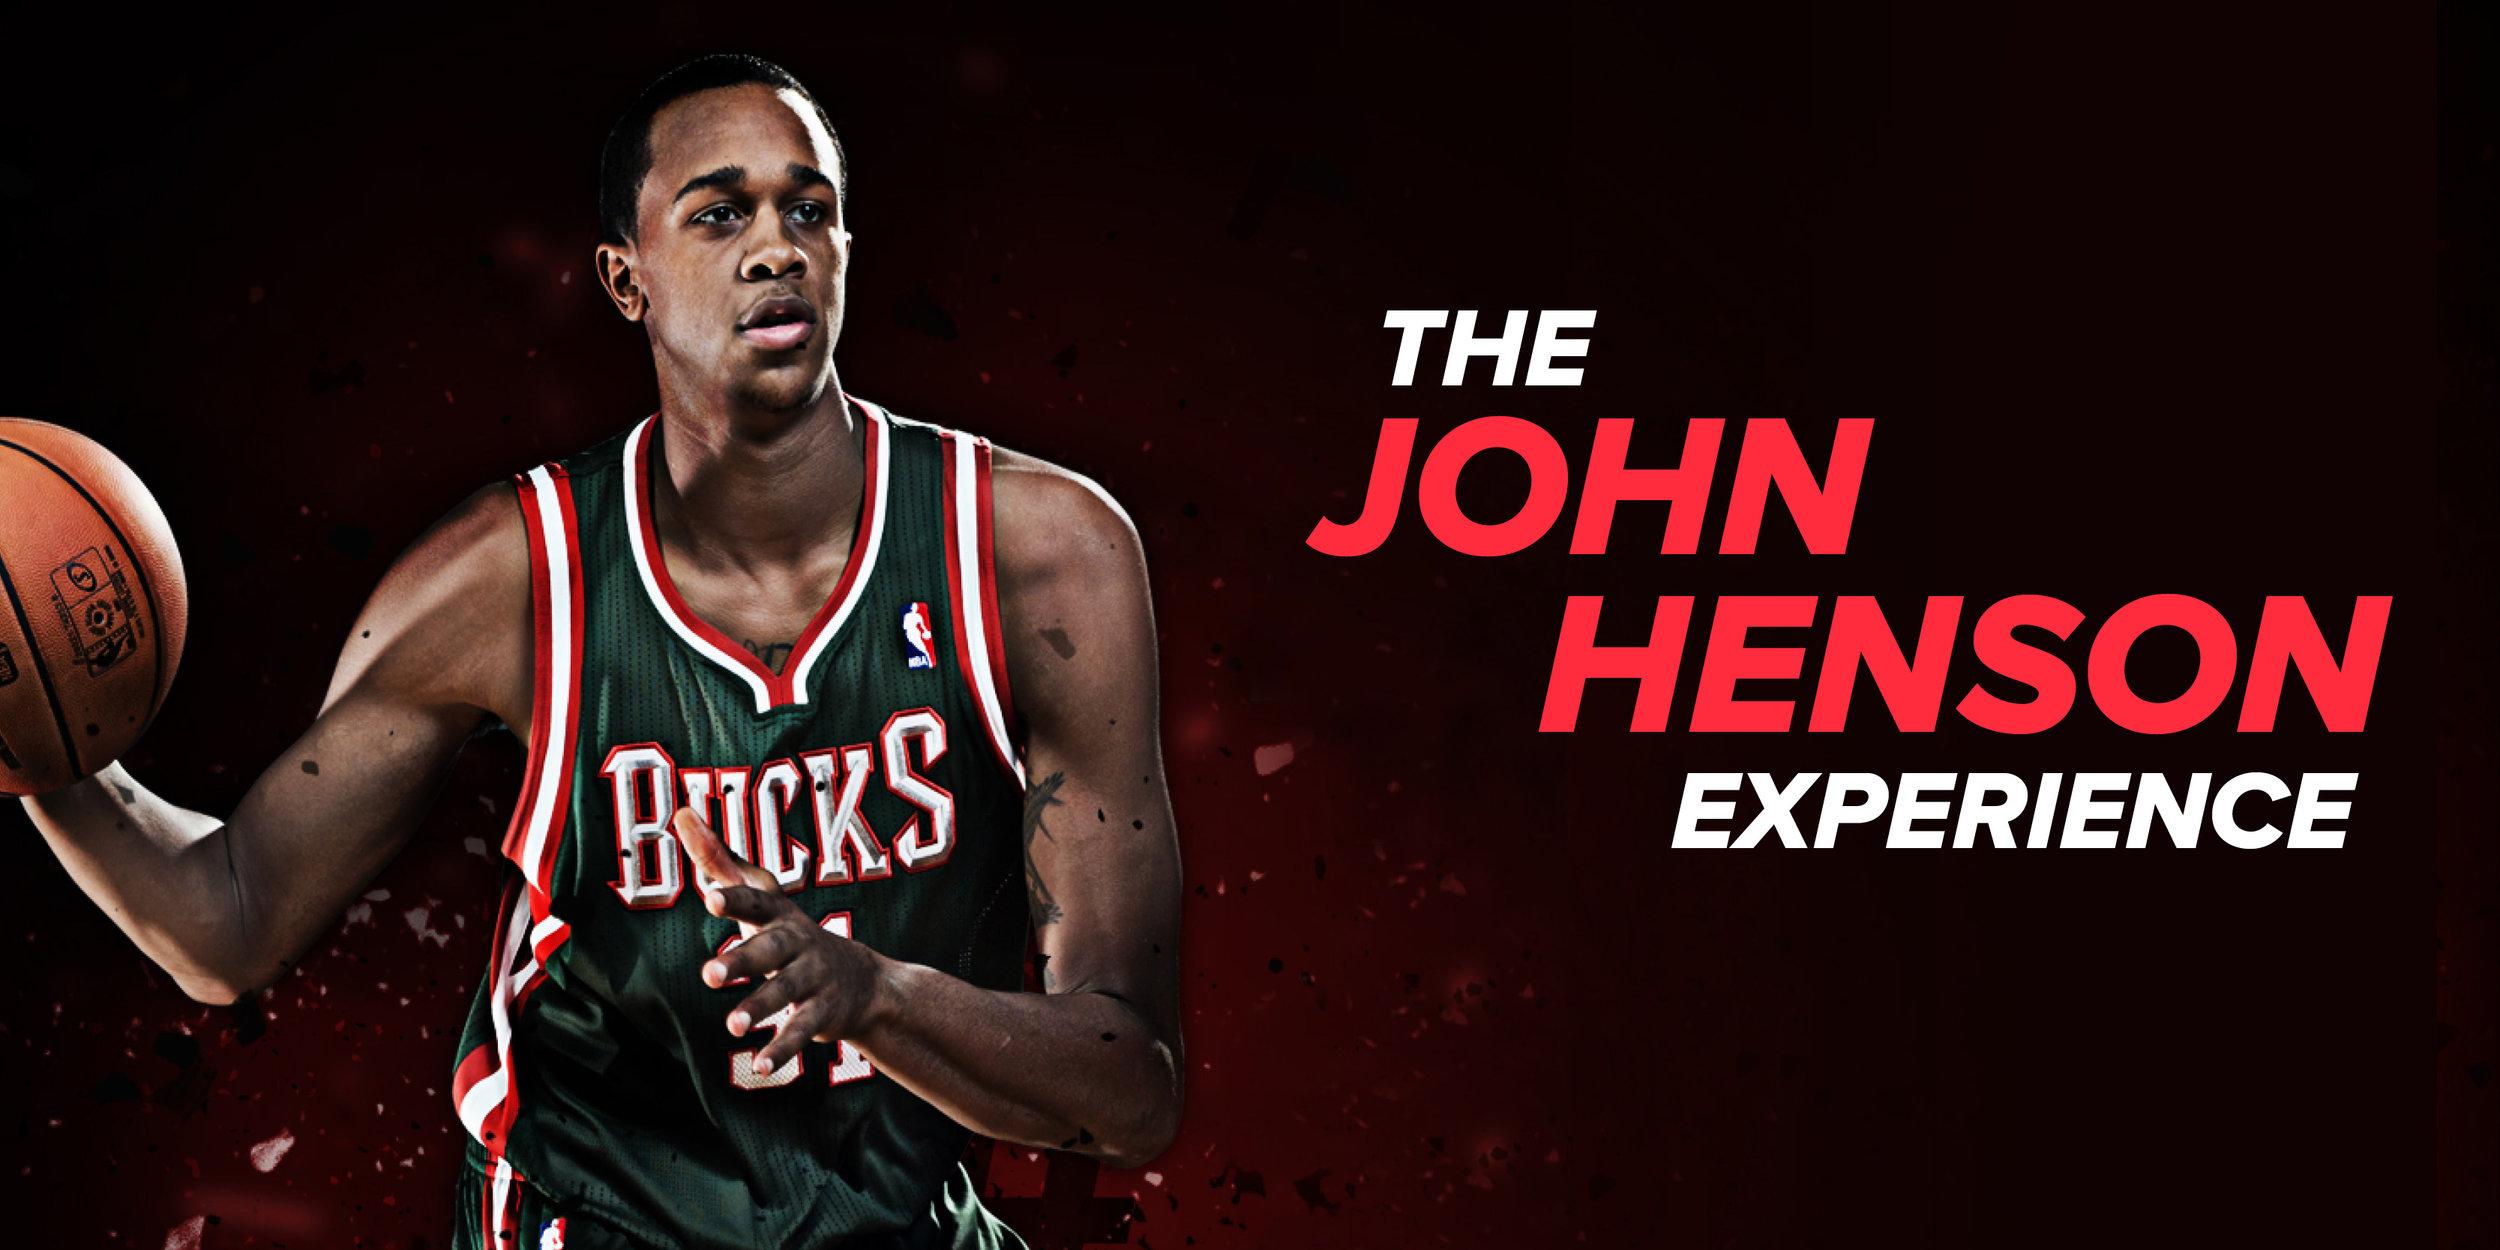 John-Henson-Experience.blog_2.jpg